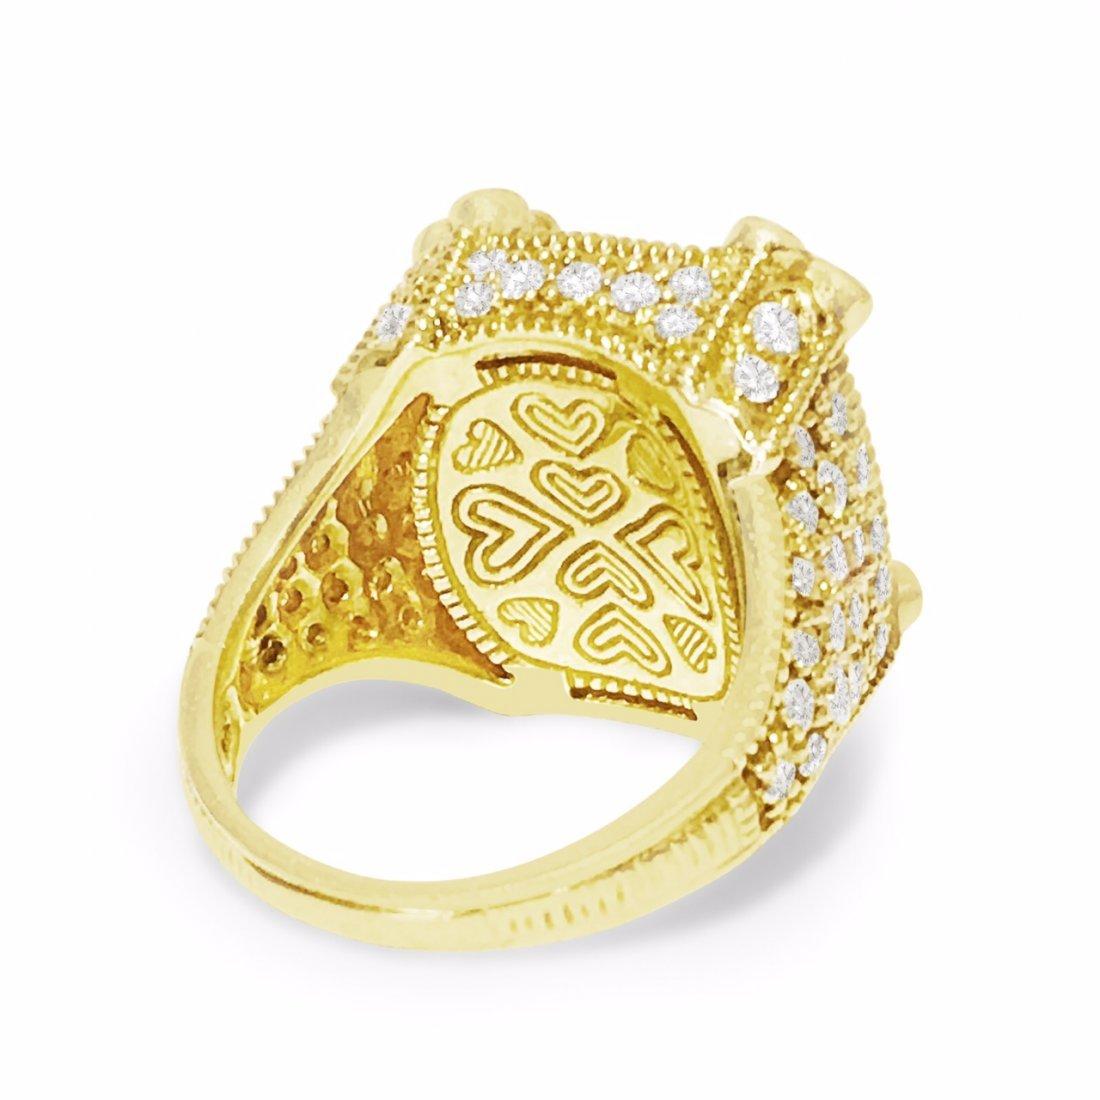 Judith Ripka 18K Gold Natural Diamond Cocktail Ring - 5